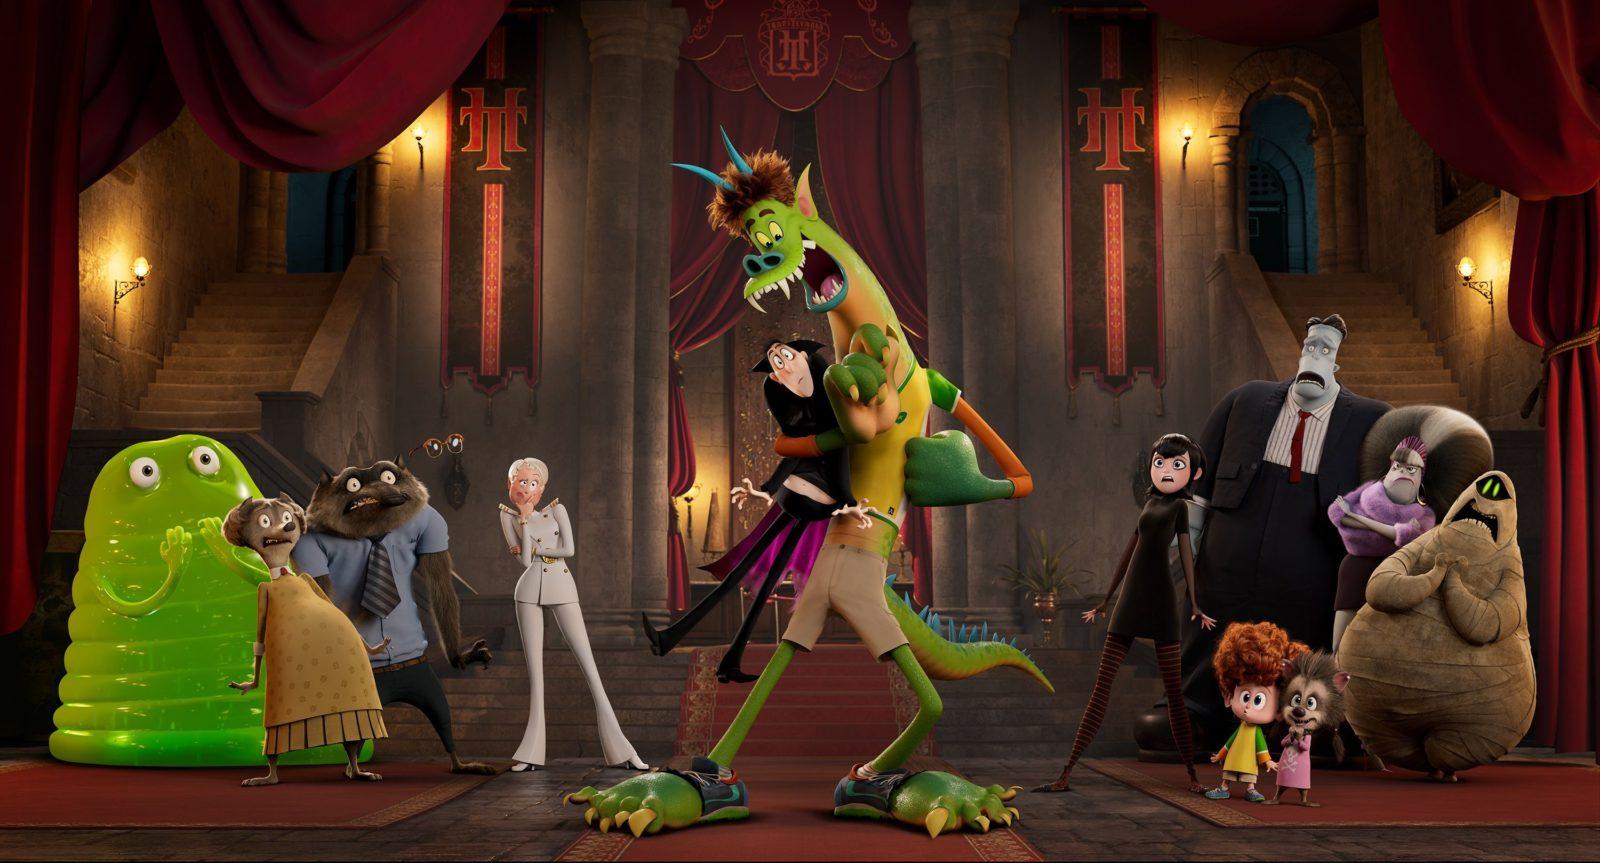 Amazon покупает у Sony мультфильм «Монстры на каникулах 4» за 0 млн